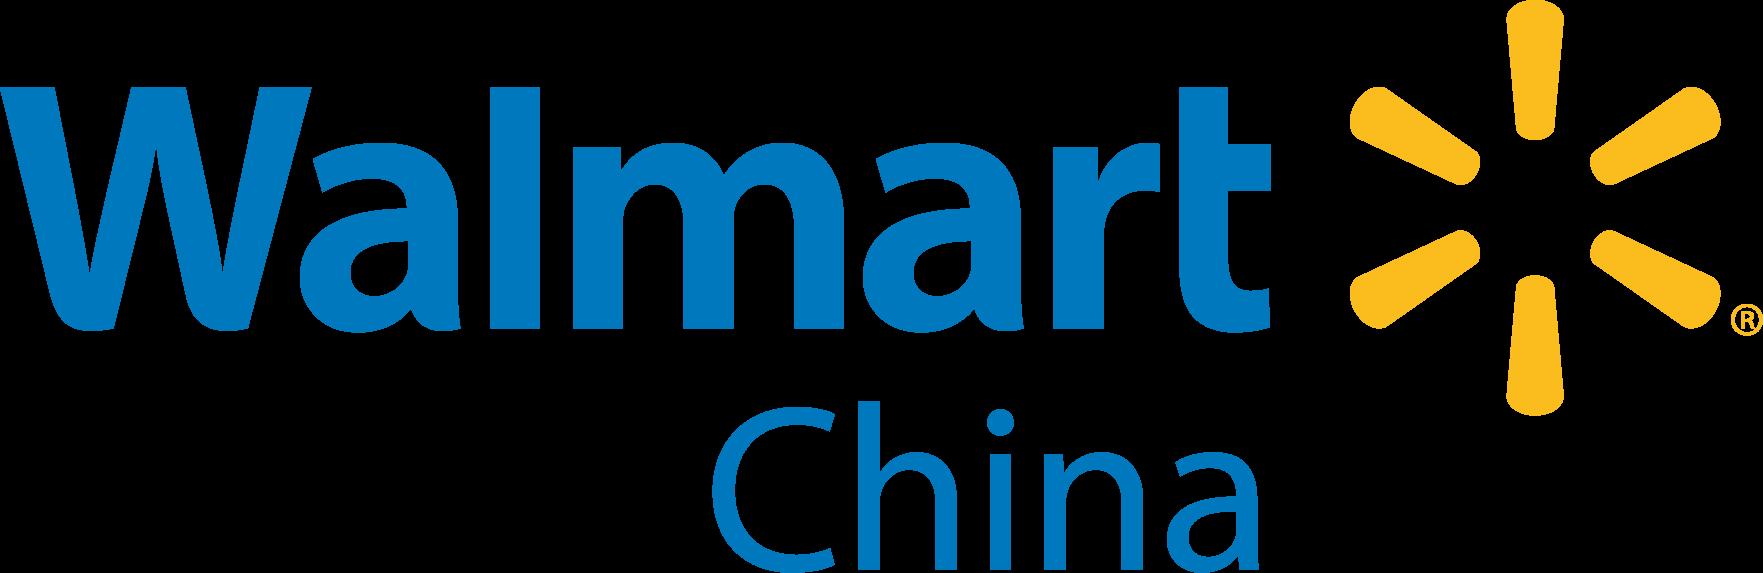 Wallmart China logo